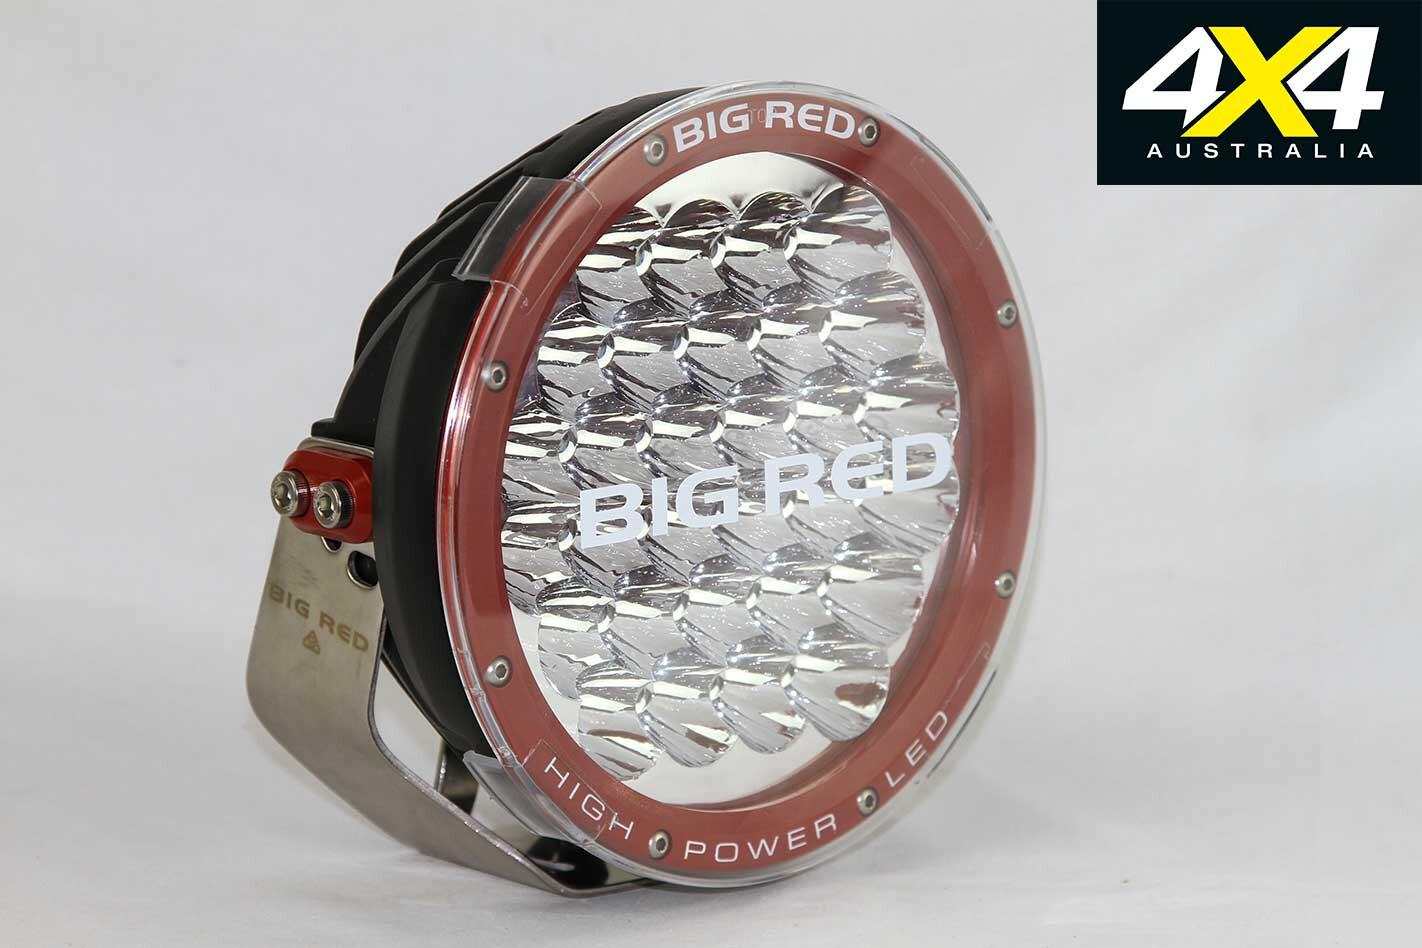 Big Red 220 High Power Jpg